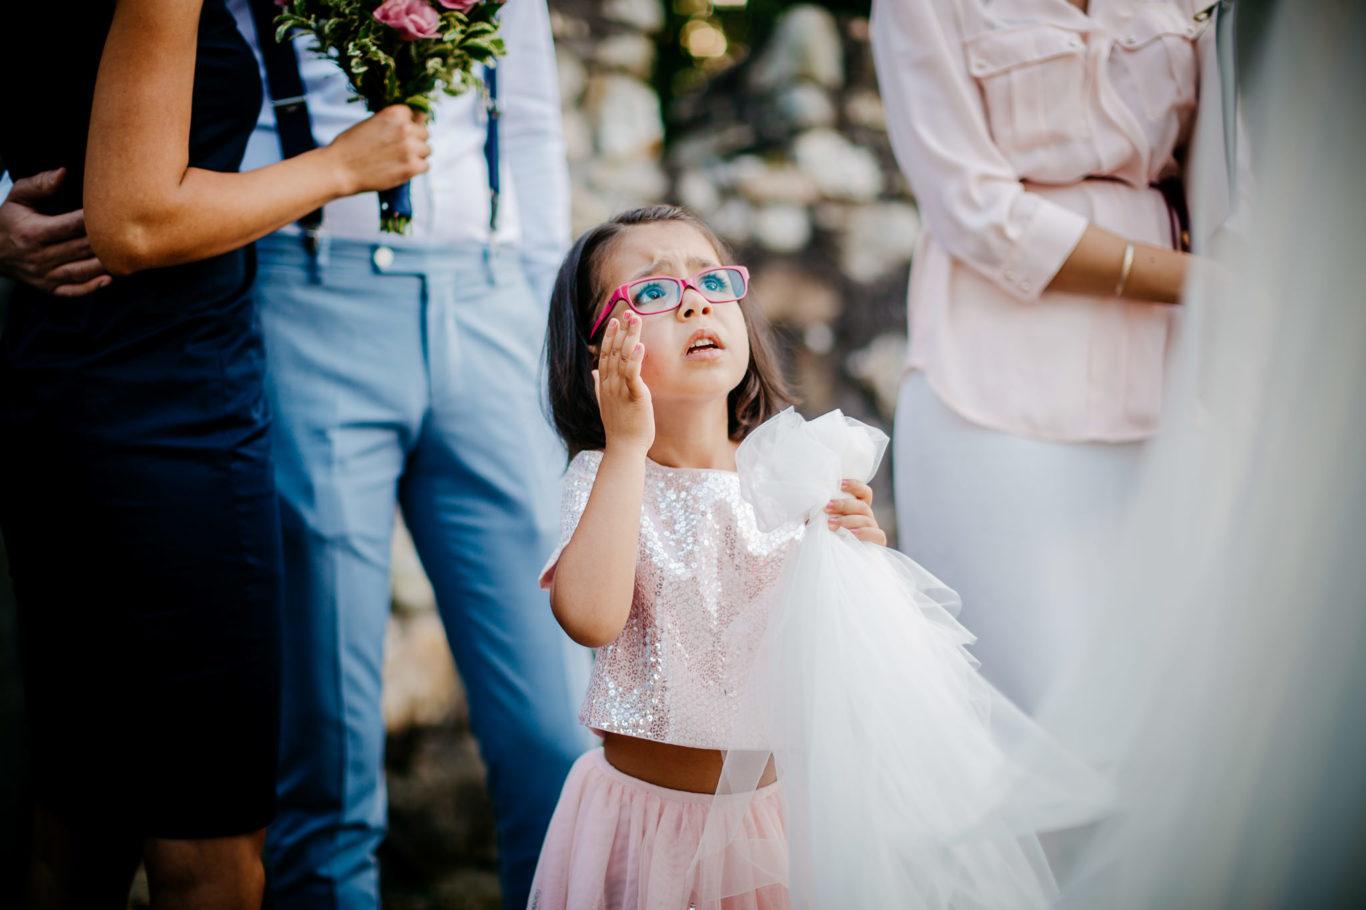 0229-fotoreportaj-nunta-conacul-maldar-cristina-stefan-fotograf-ciprian-dumitrescu-cd2_2956